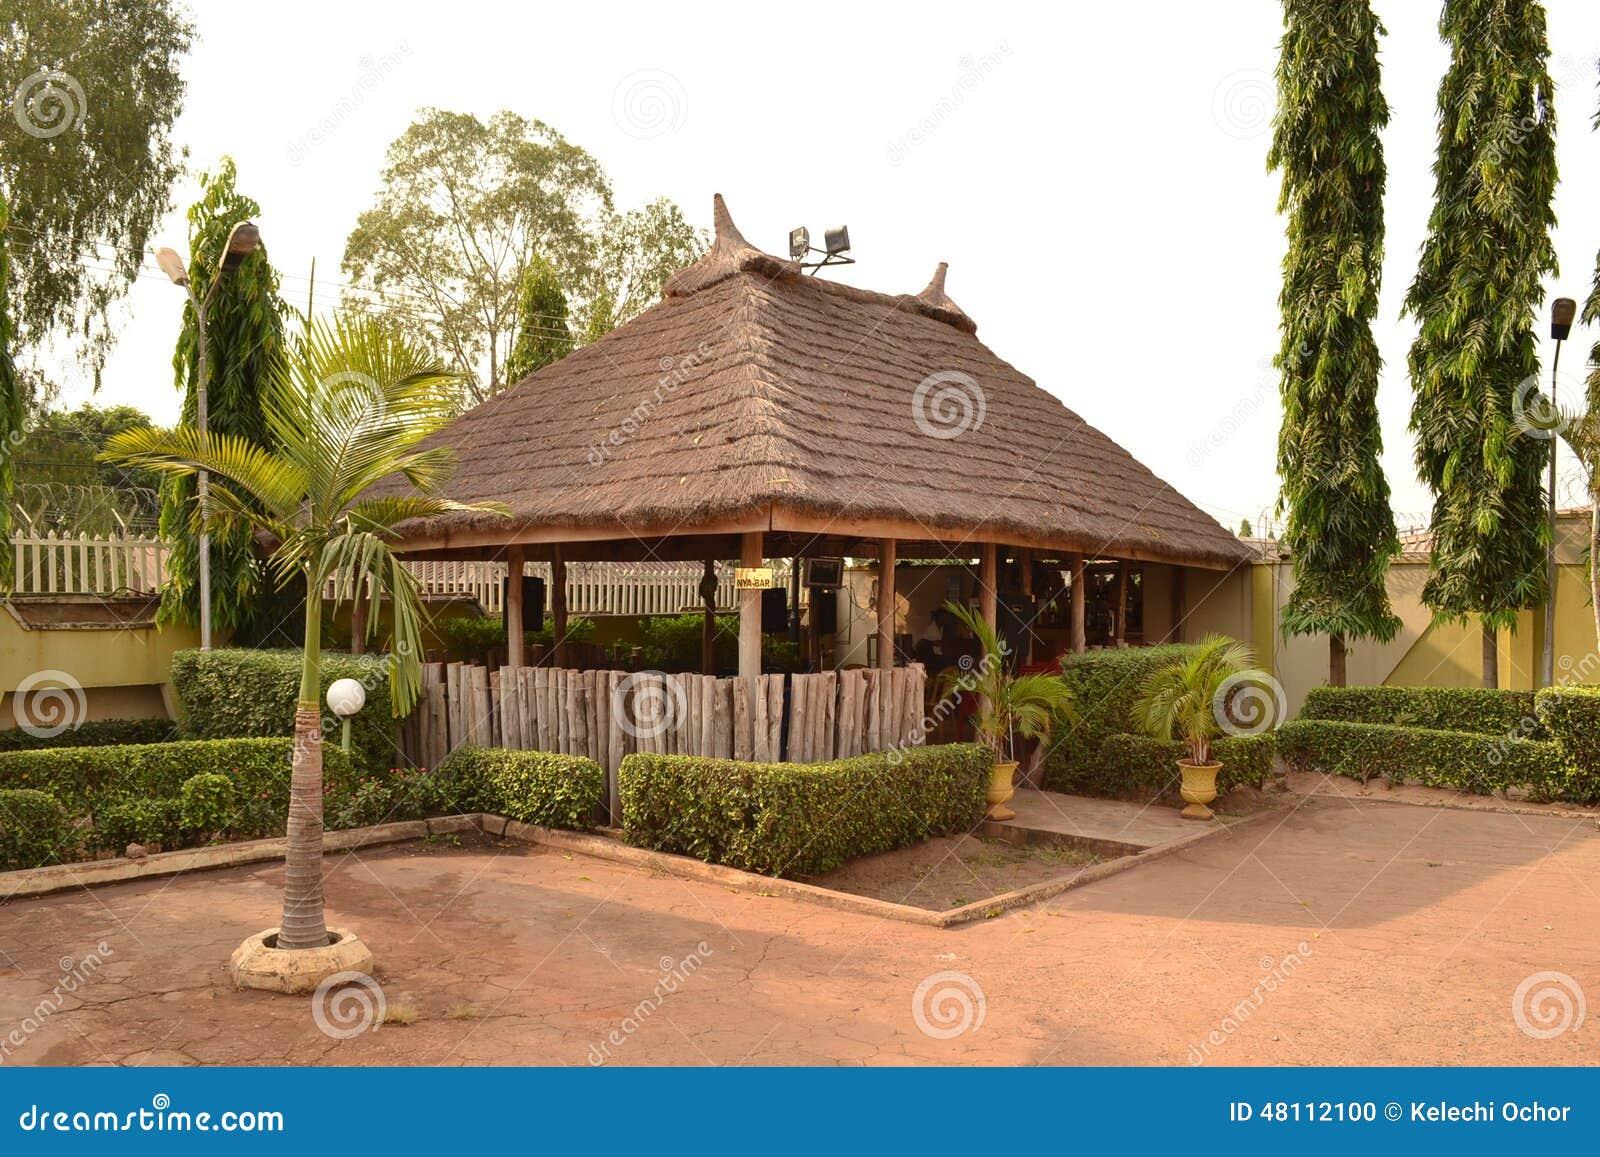 African Bush Bar Stock Photo Image 48112100